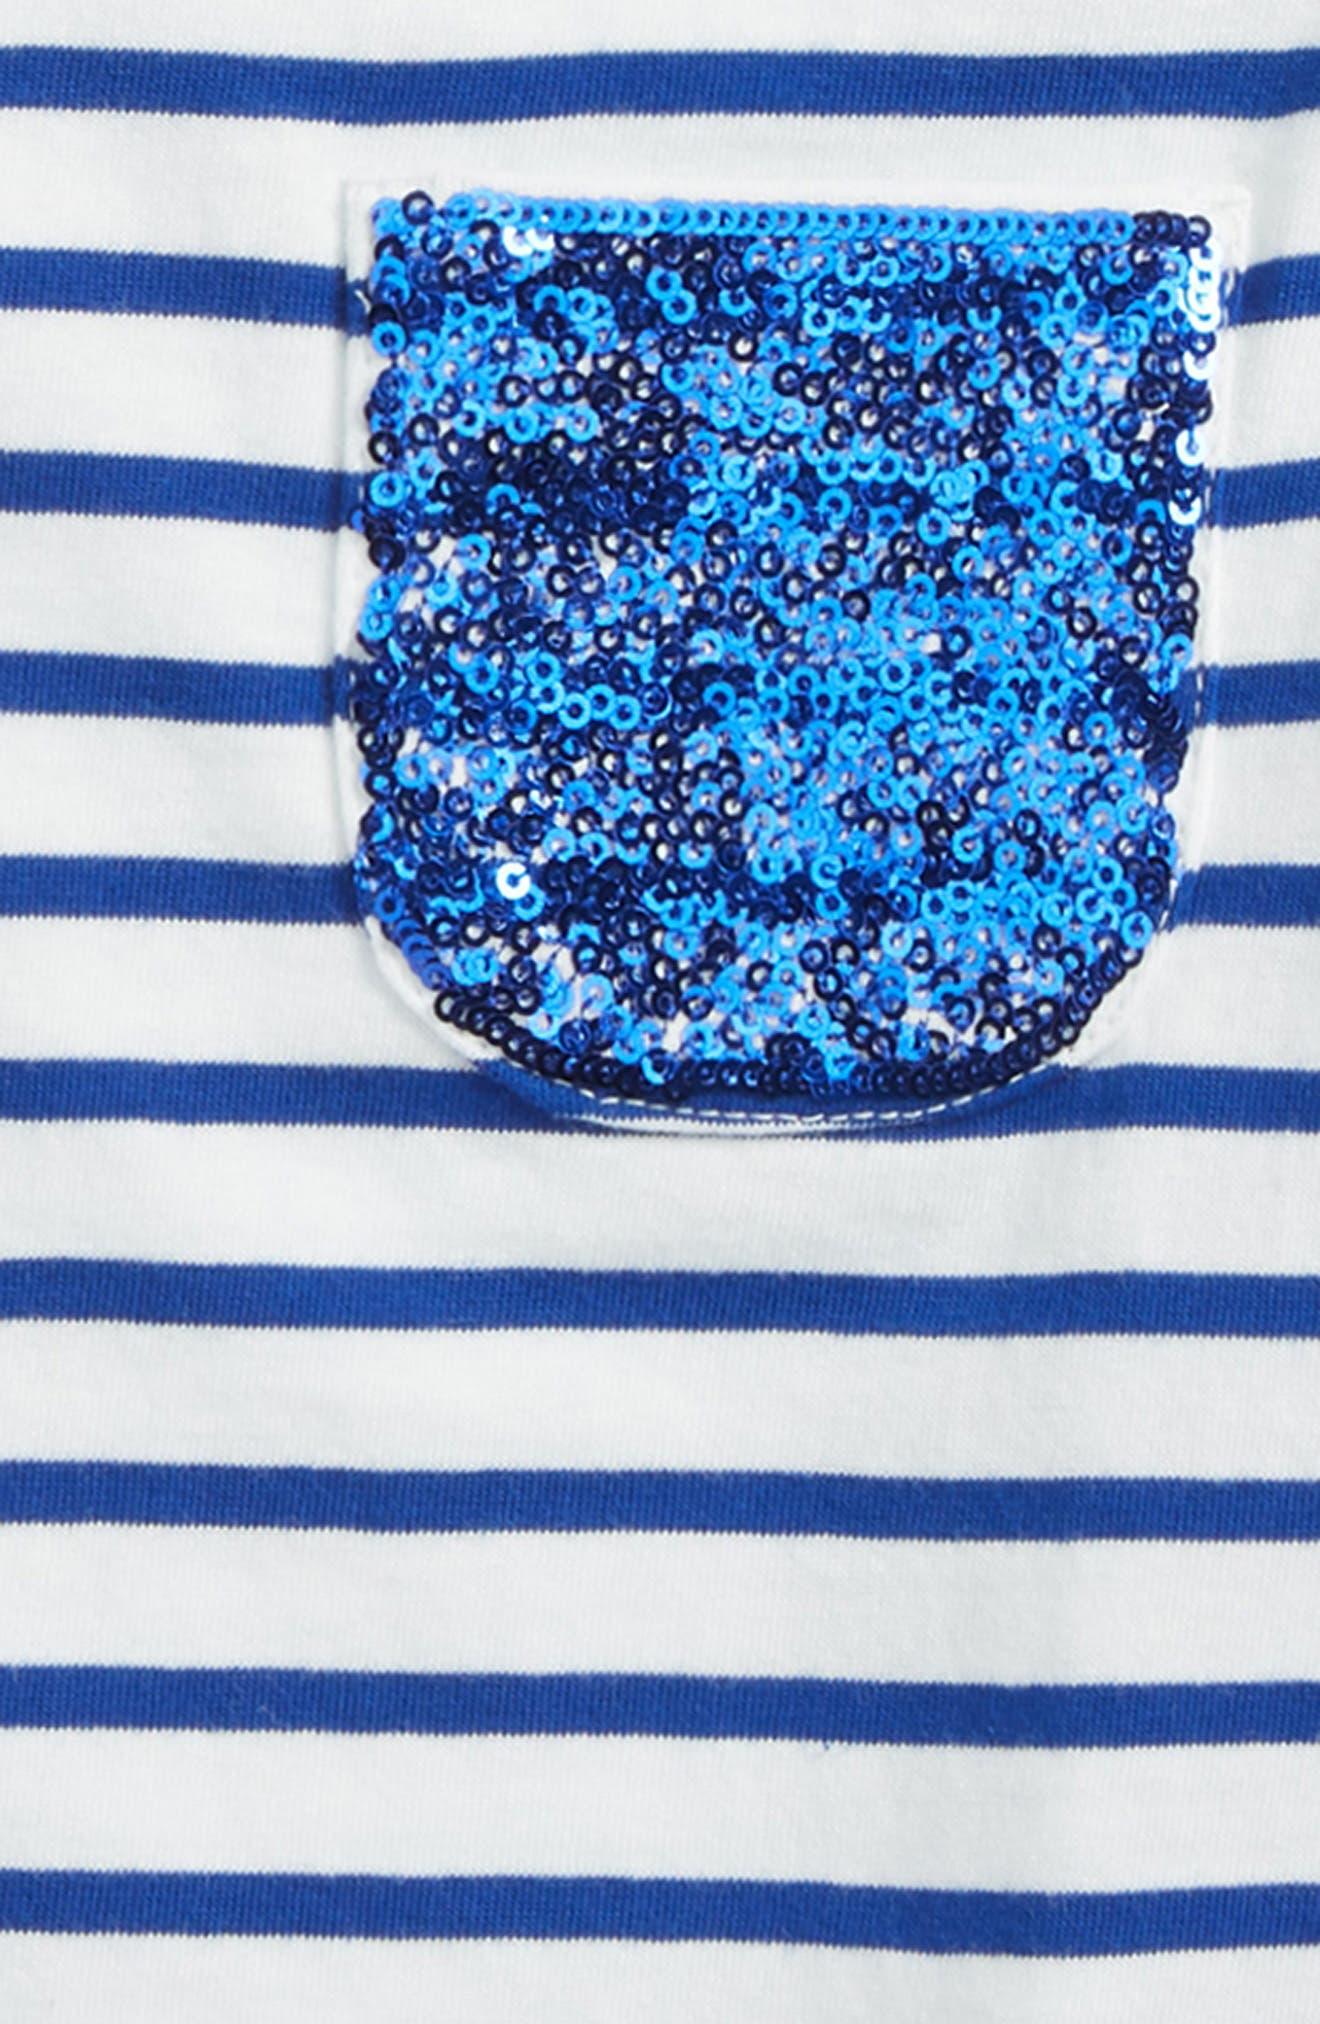 Sequin Pocket Tee,                             Alternate thumbnail 2, color,                             Ivory/ Orion Blue